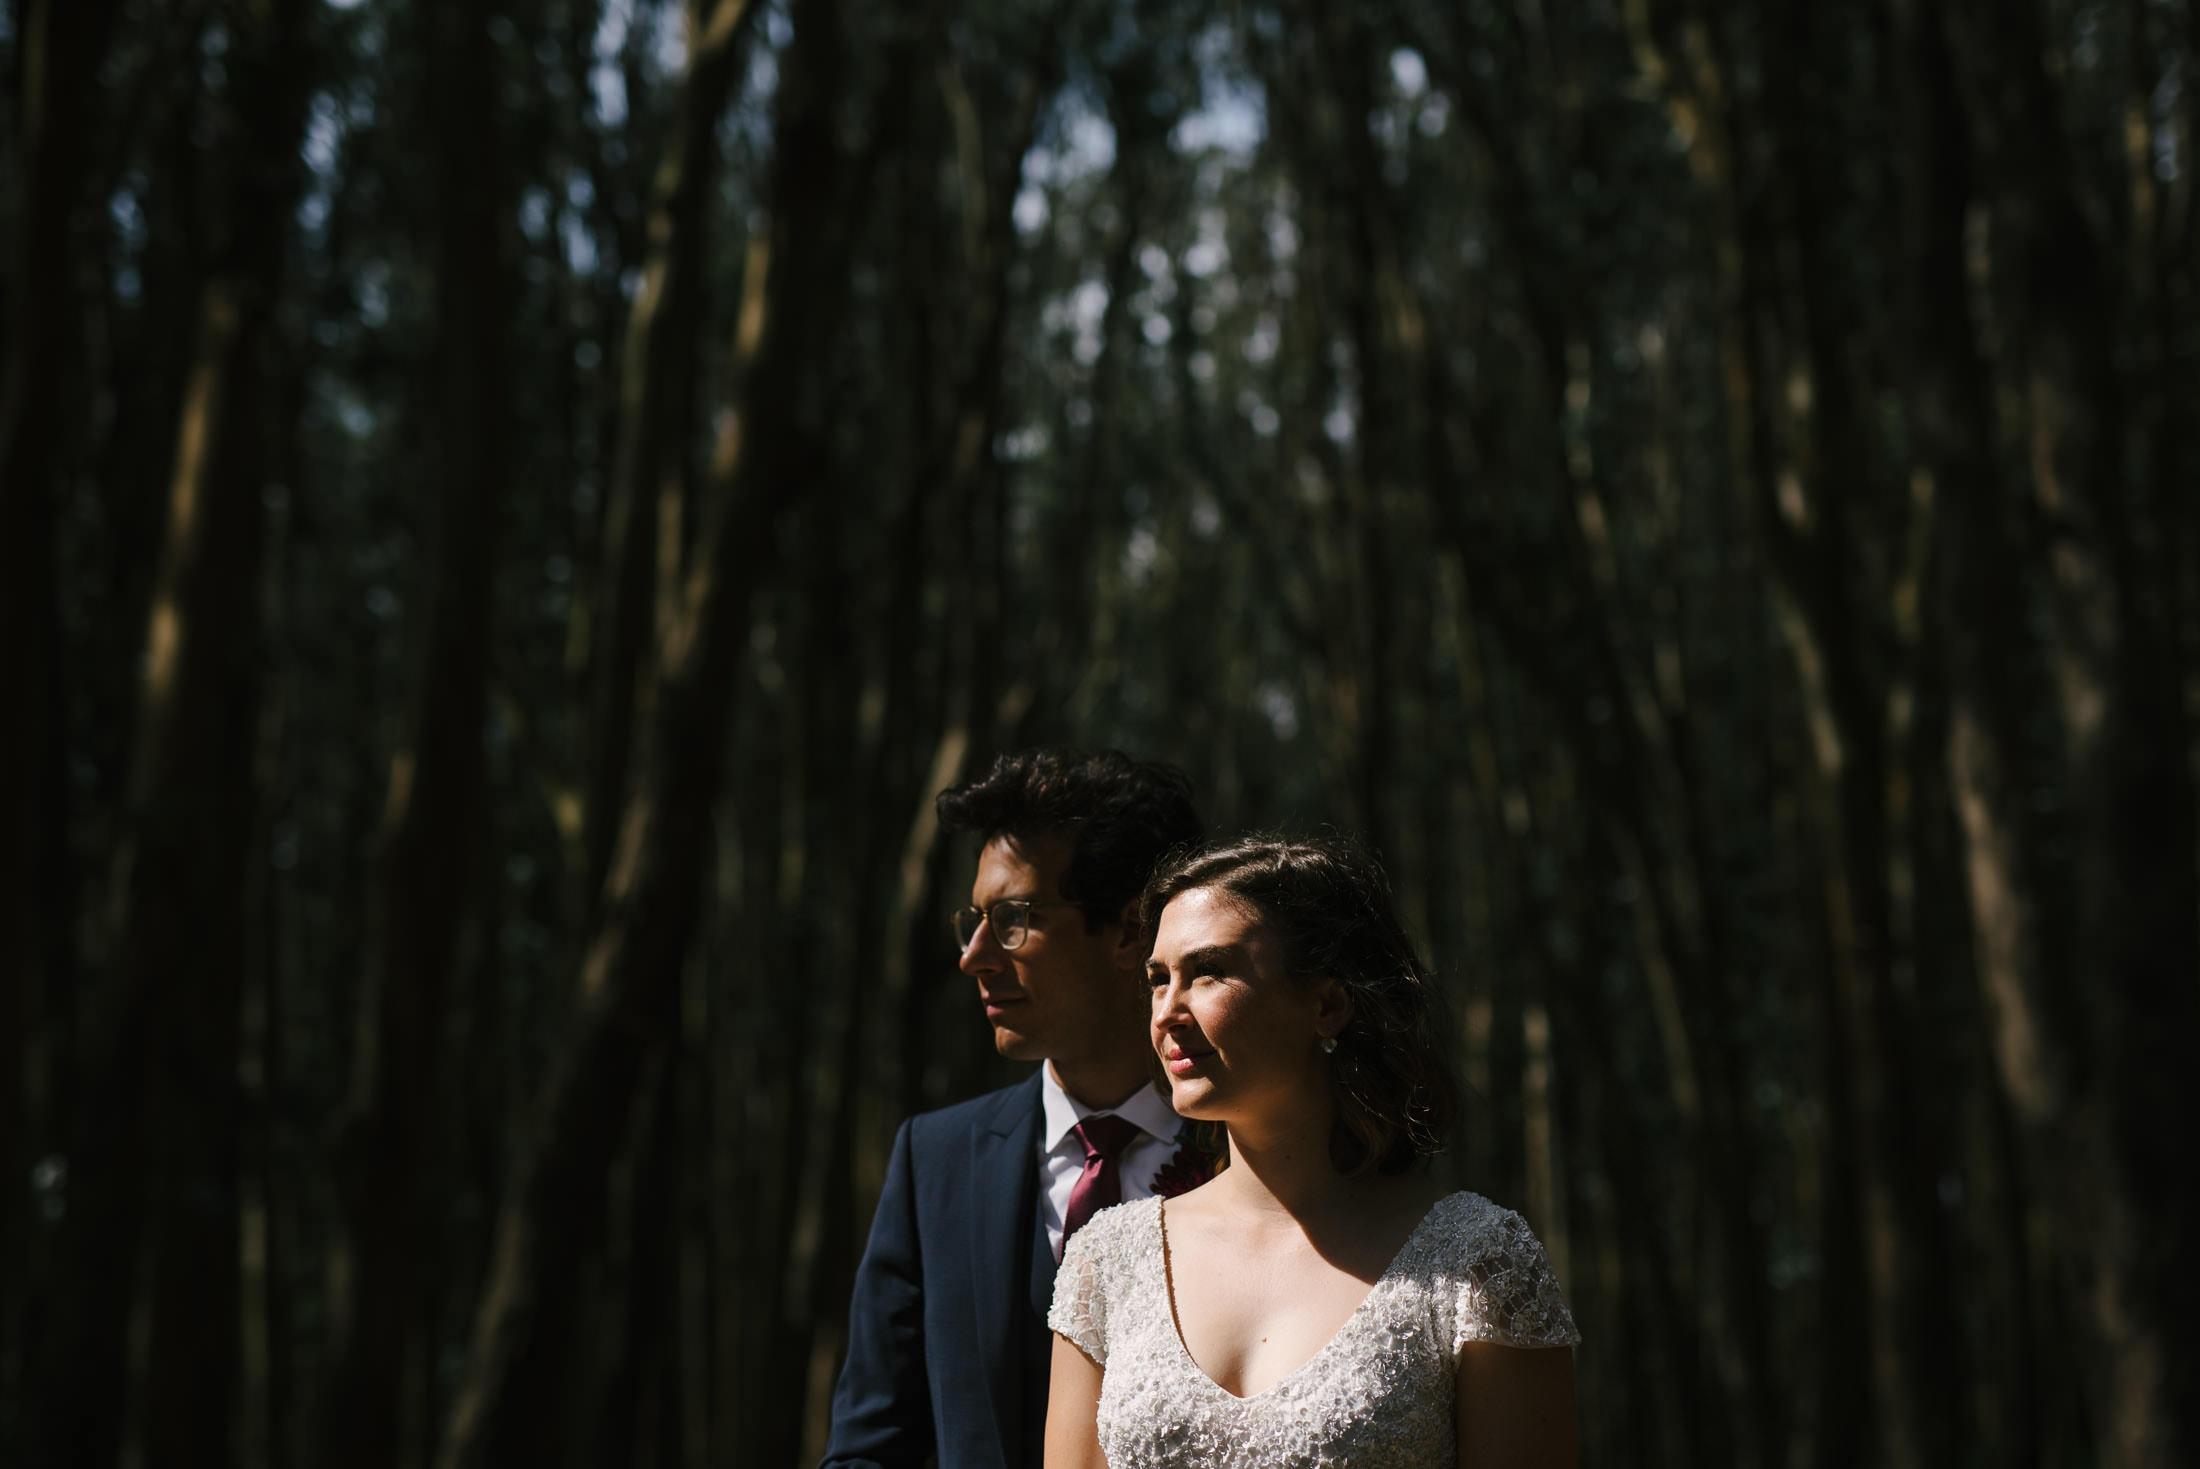 Wood Line Wedding Portrait